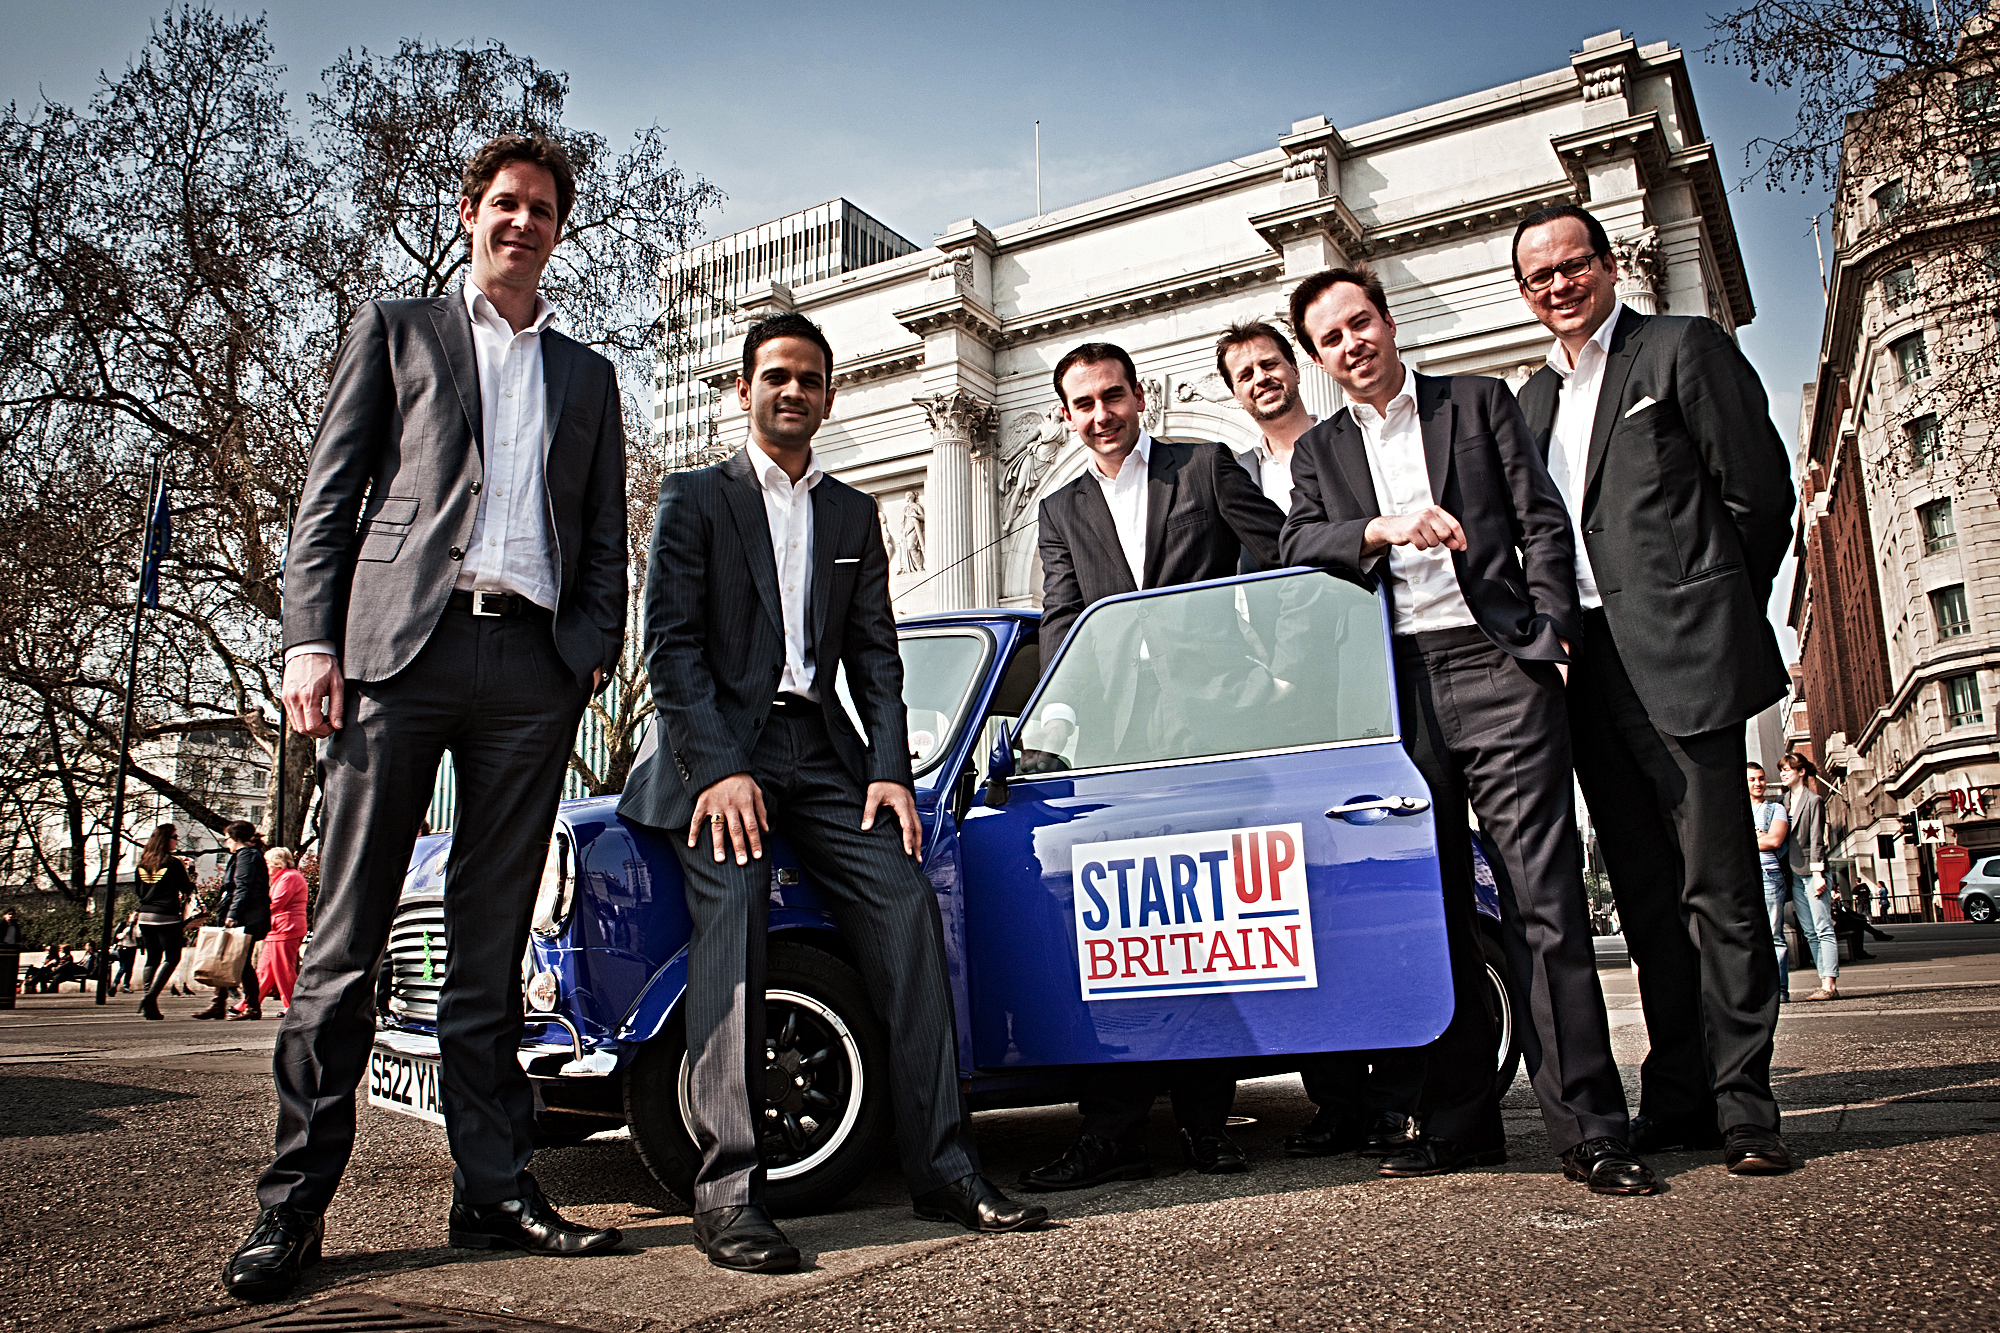 Startup Britain: entrepreneurs behind it